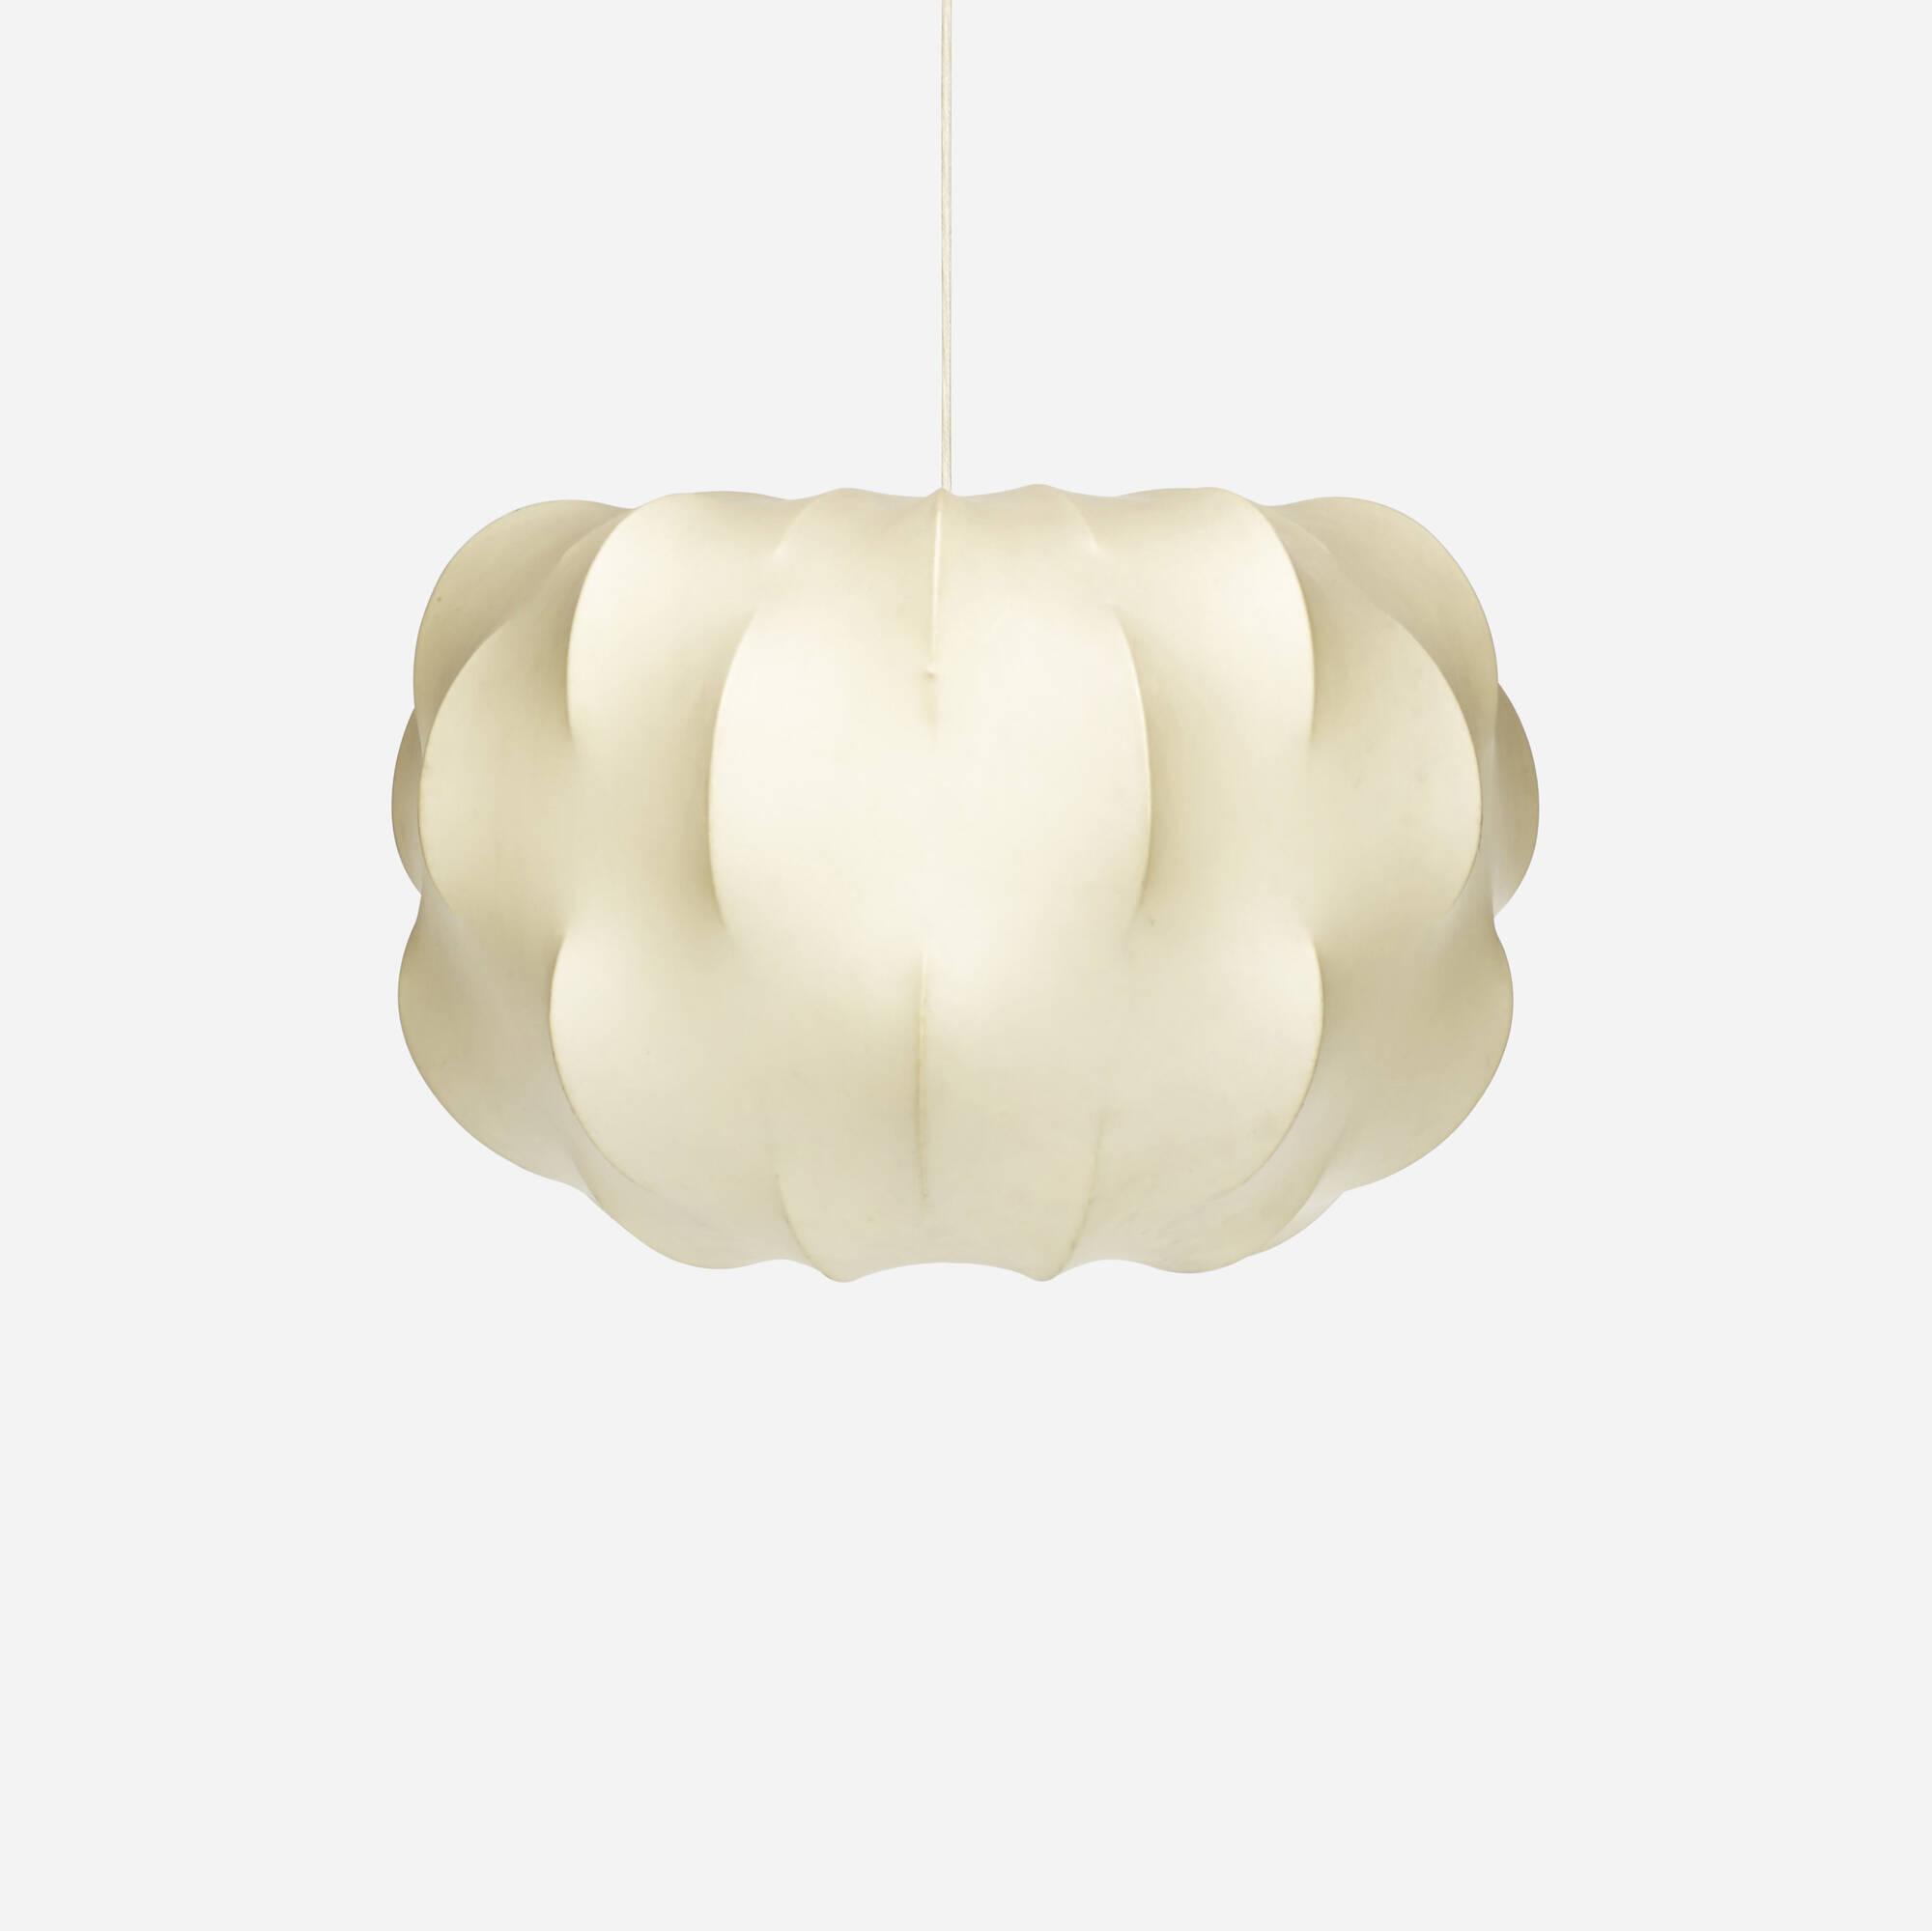 714: Tobia Scarpa / Nuvola chandelier (1 of 3)